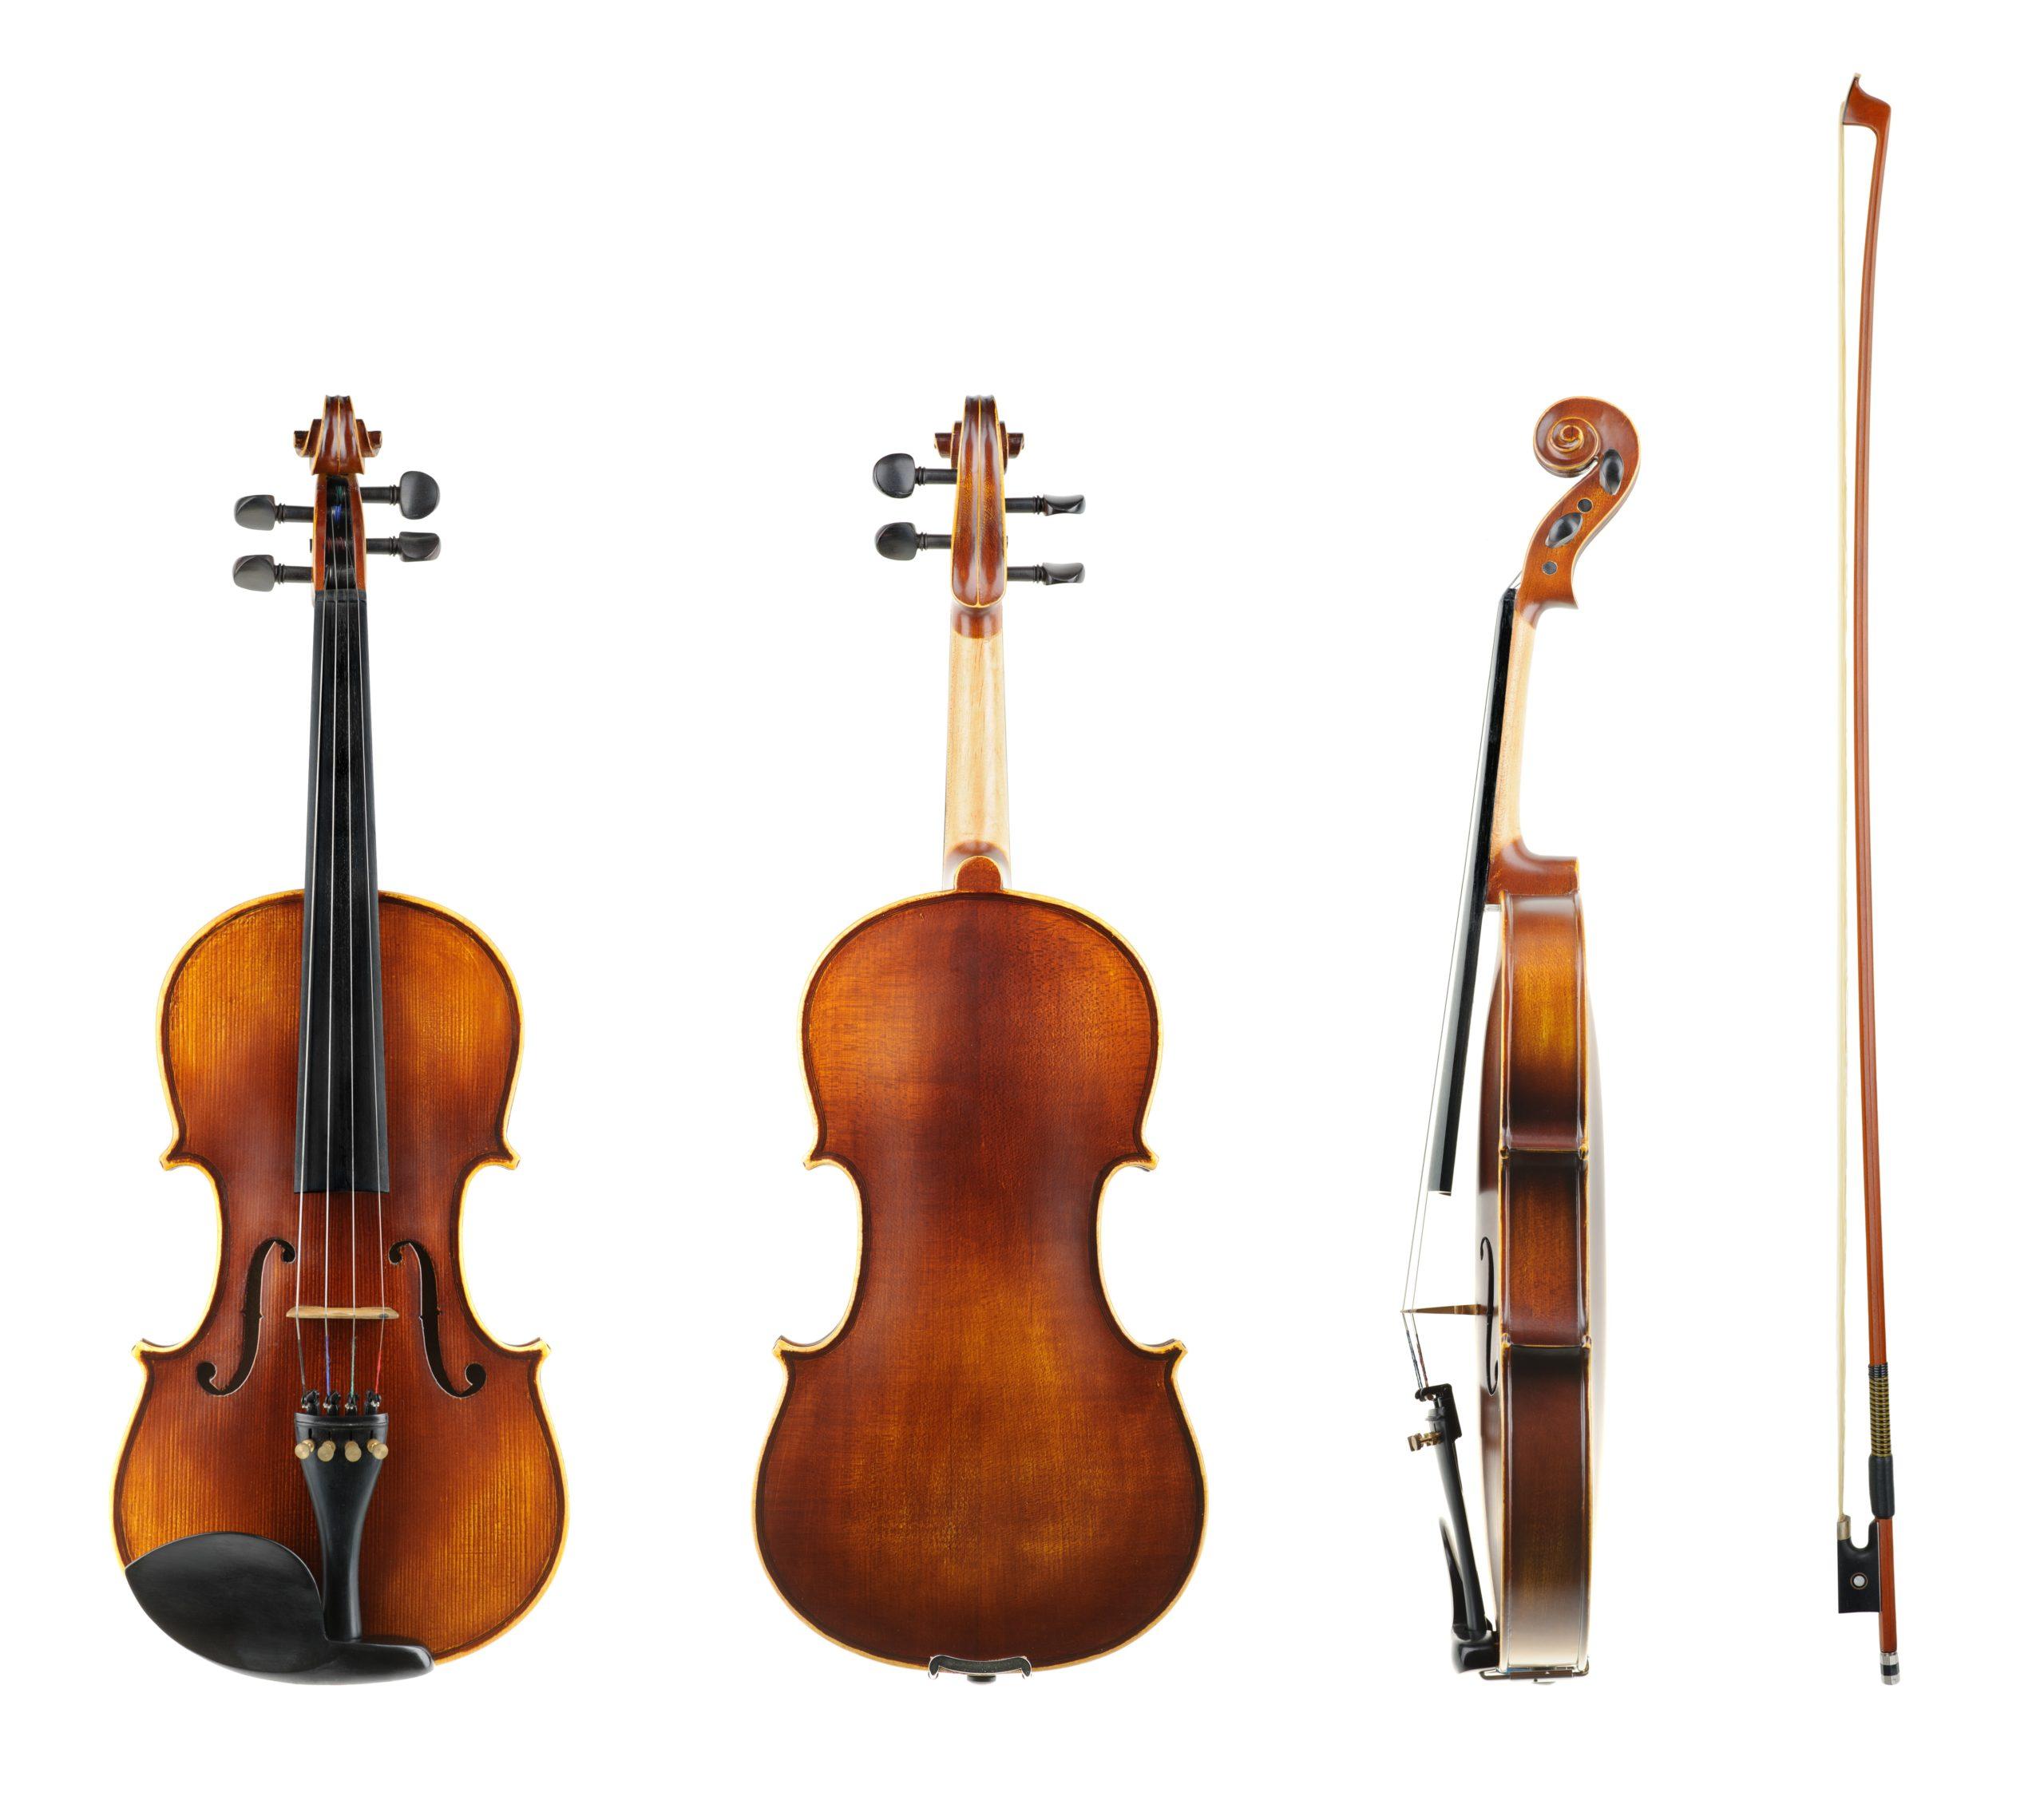 The-Most-Popular-Violin-Types-Modern-Violin